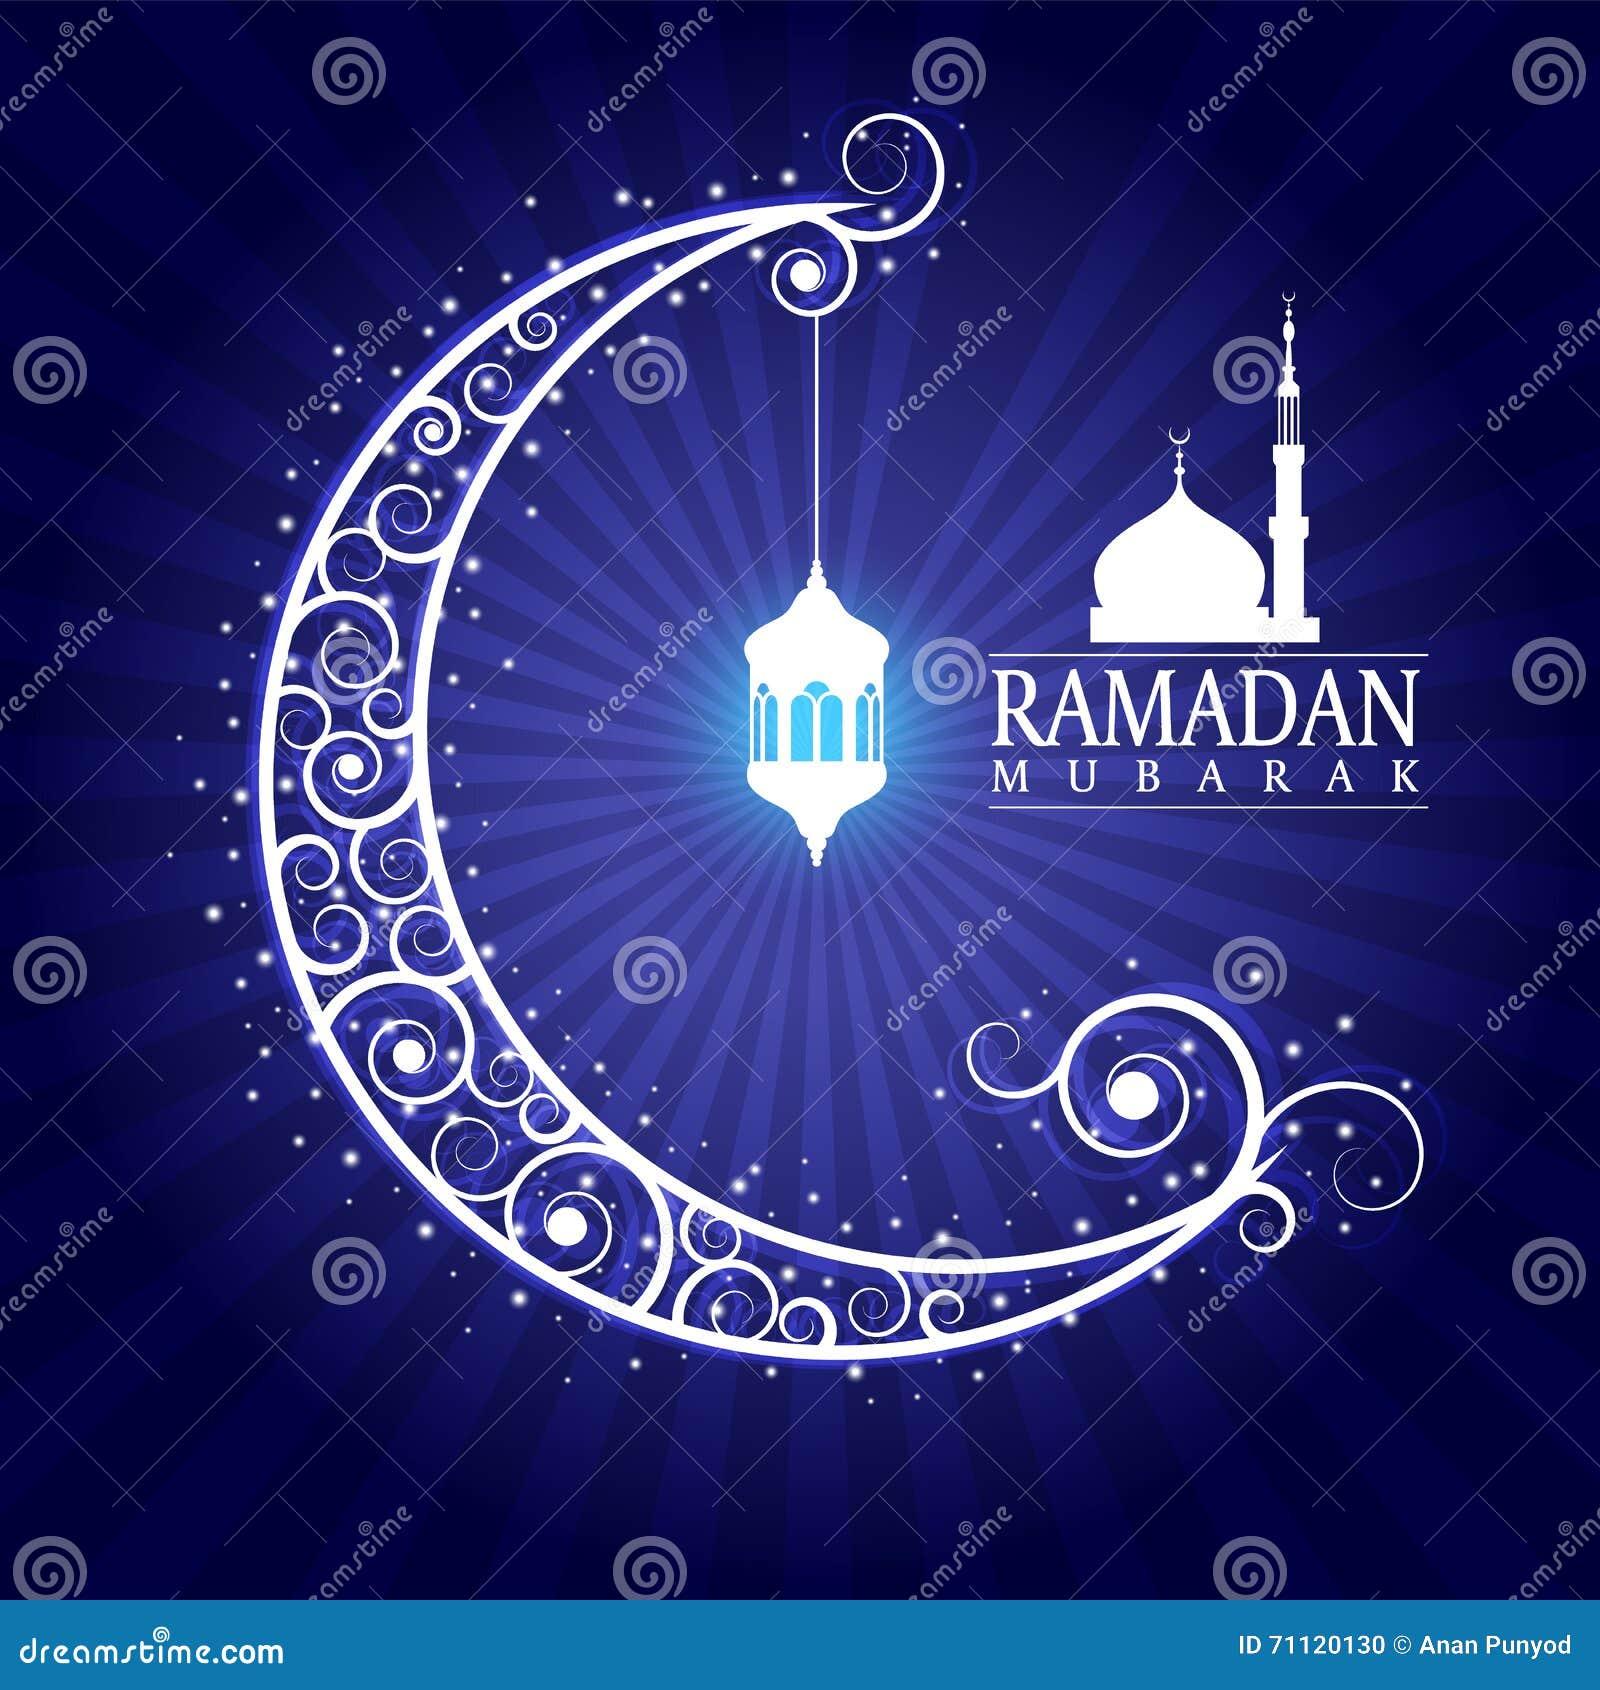 ramadan mubarak hanging lamps on moon and masjid on blue